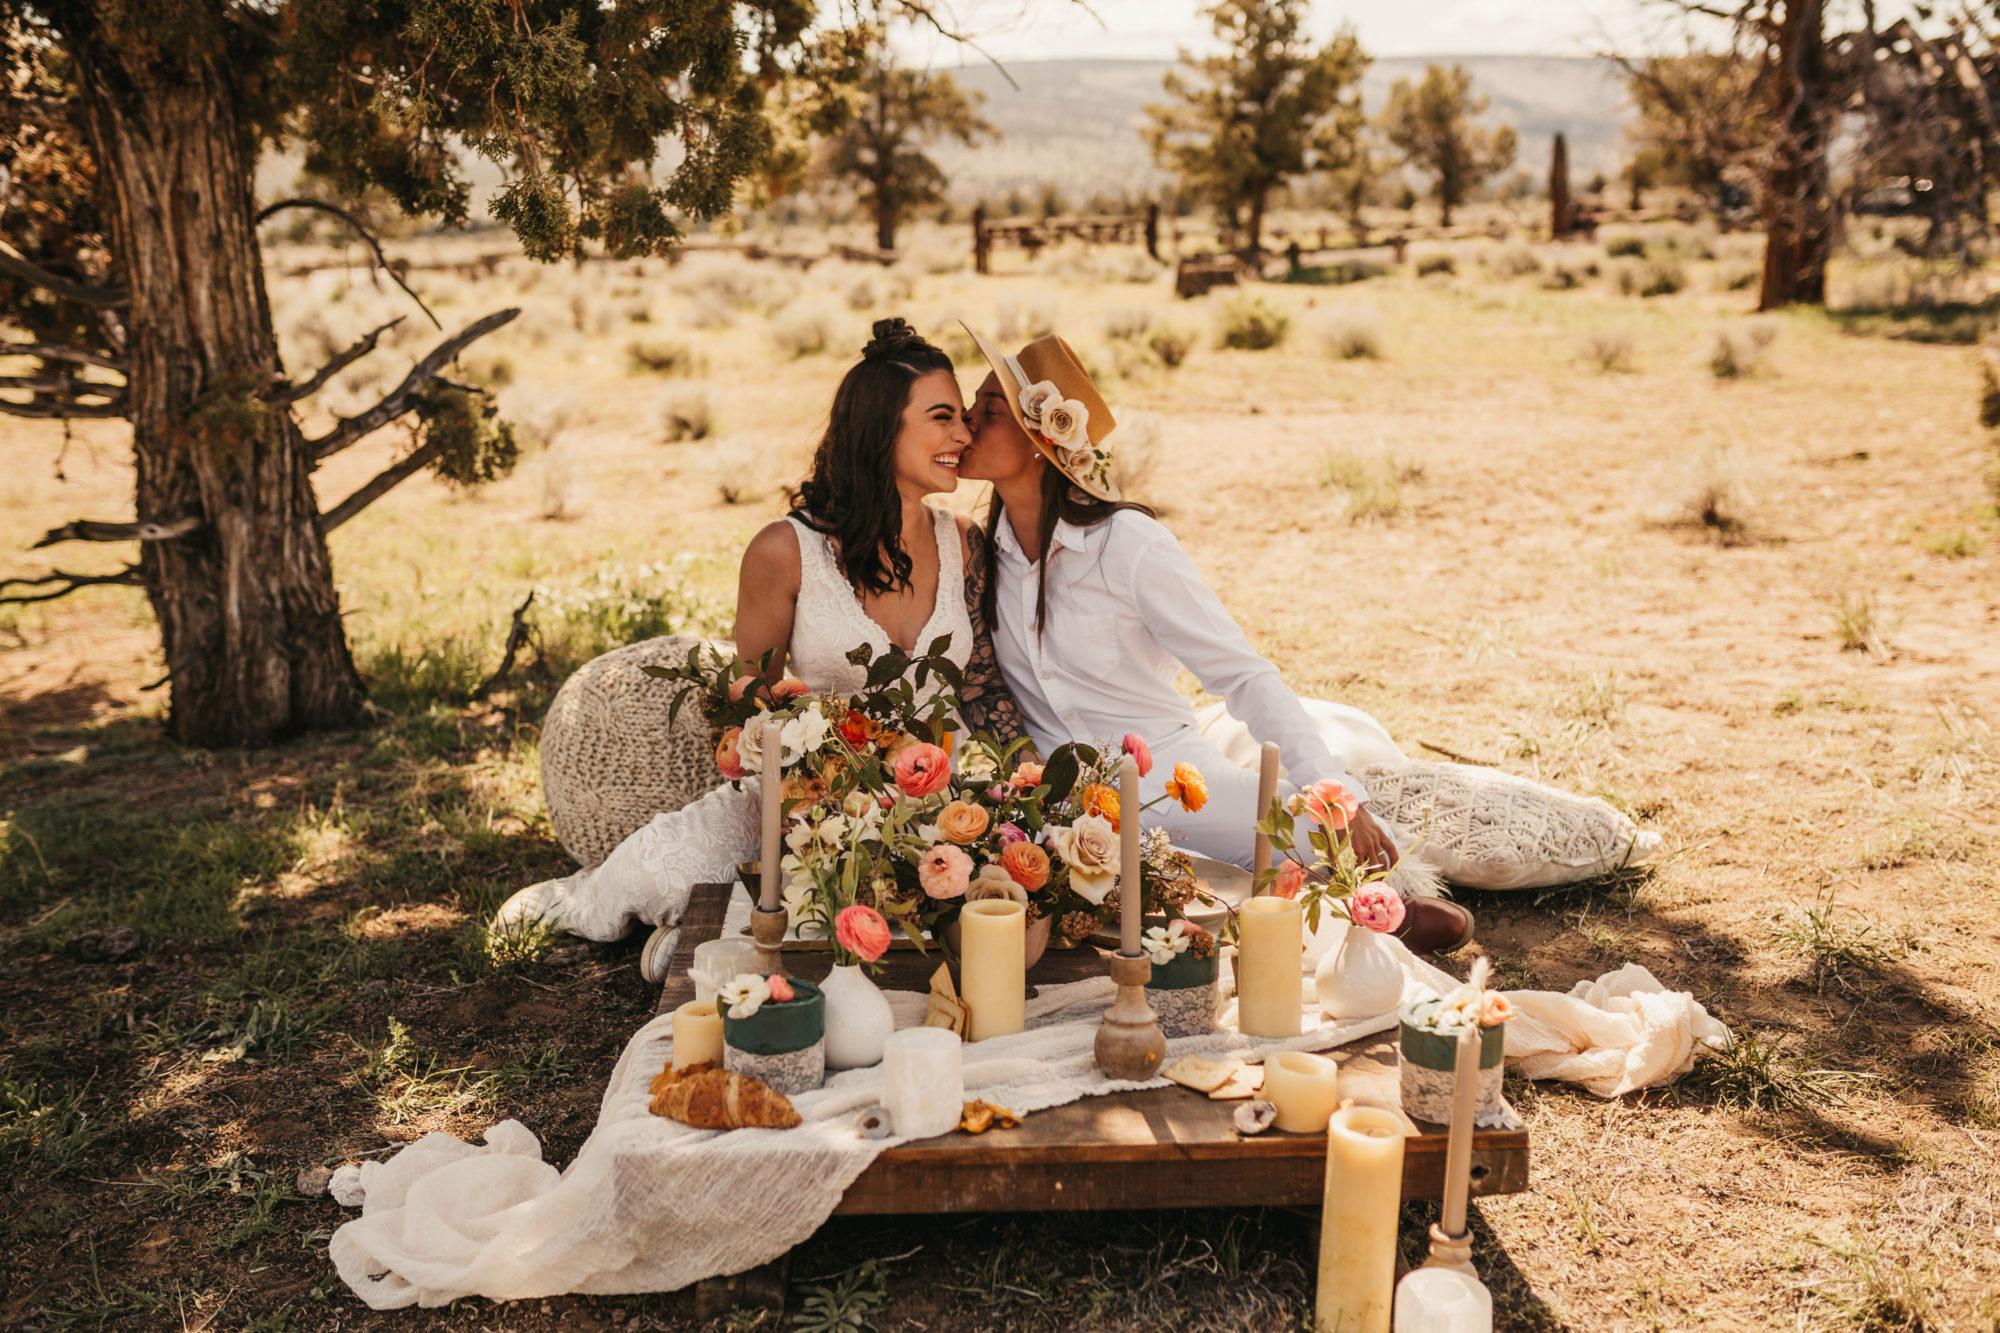 Two girls celebrating their same sex wedding